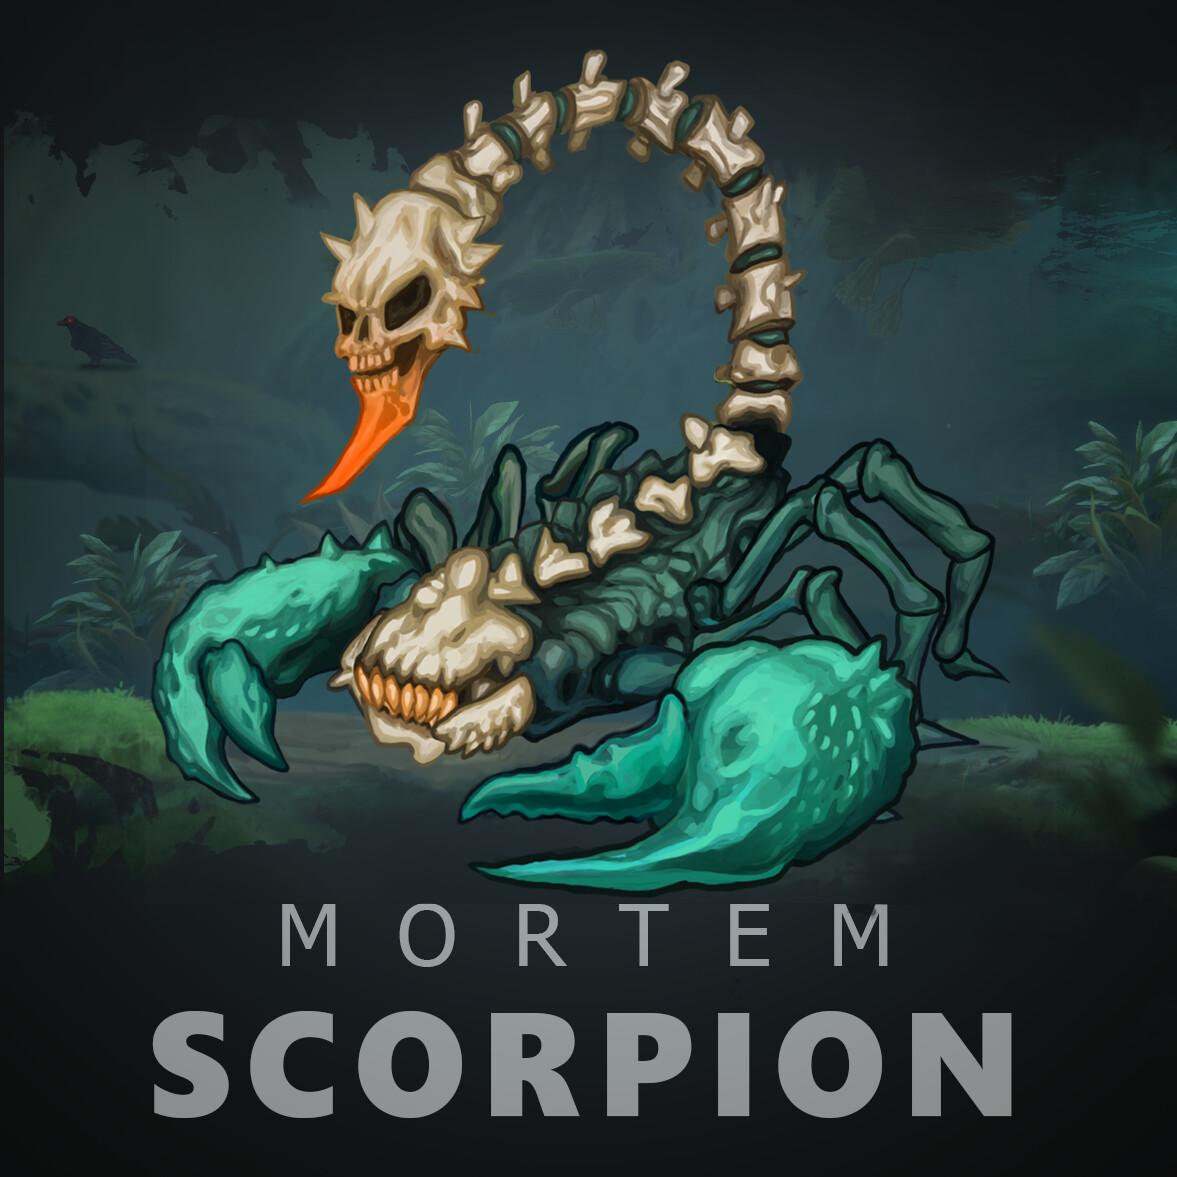 MORTEM SCORPION